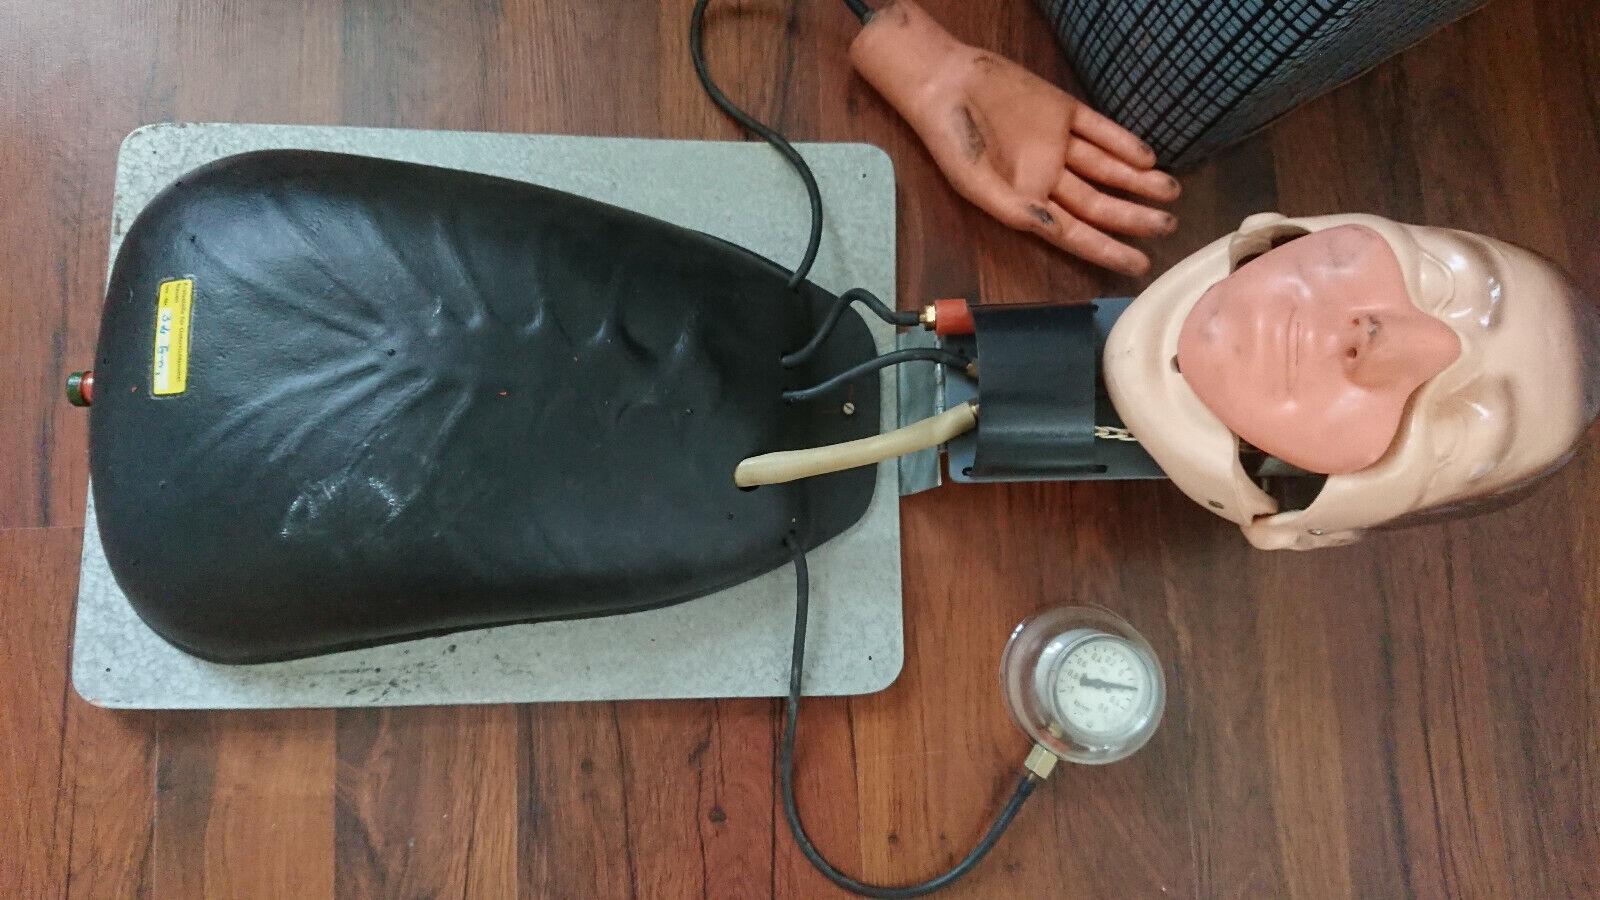 Reanimation Übungs- Lehr-Puppe Wiederbelebung Beatmung Torso DDR vintage Koffer